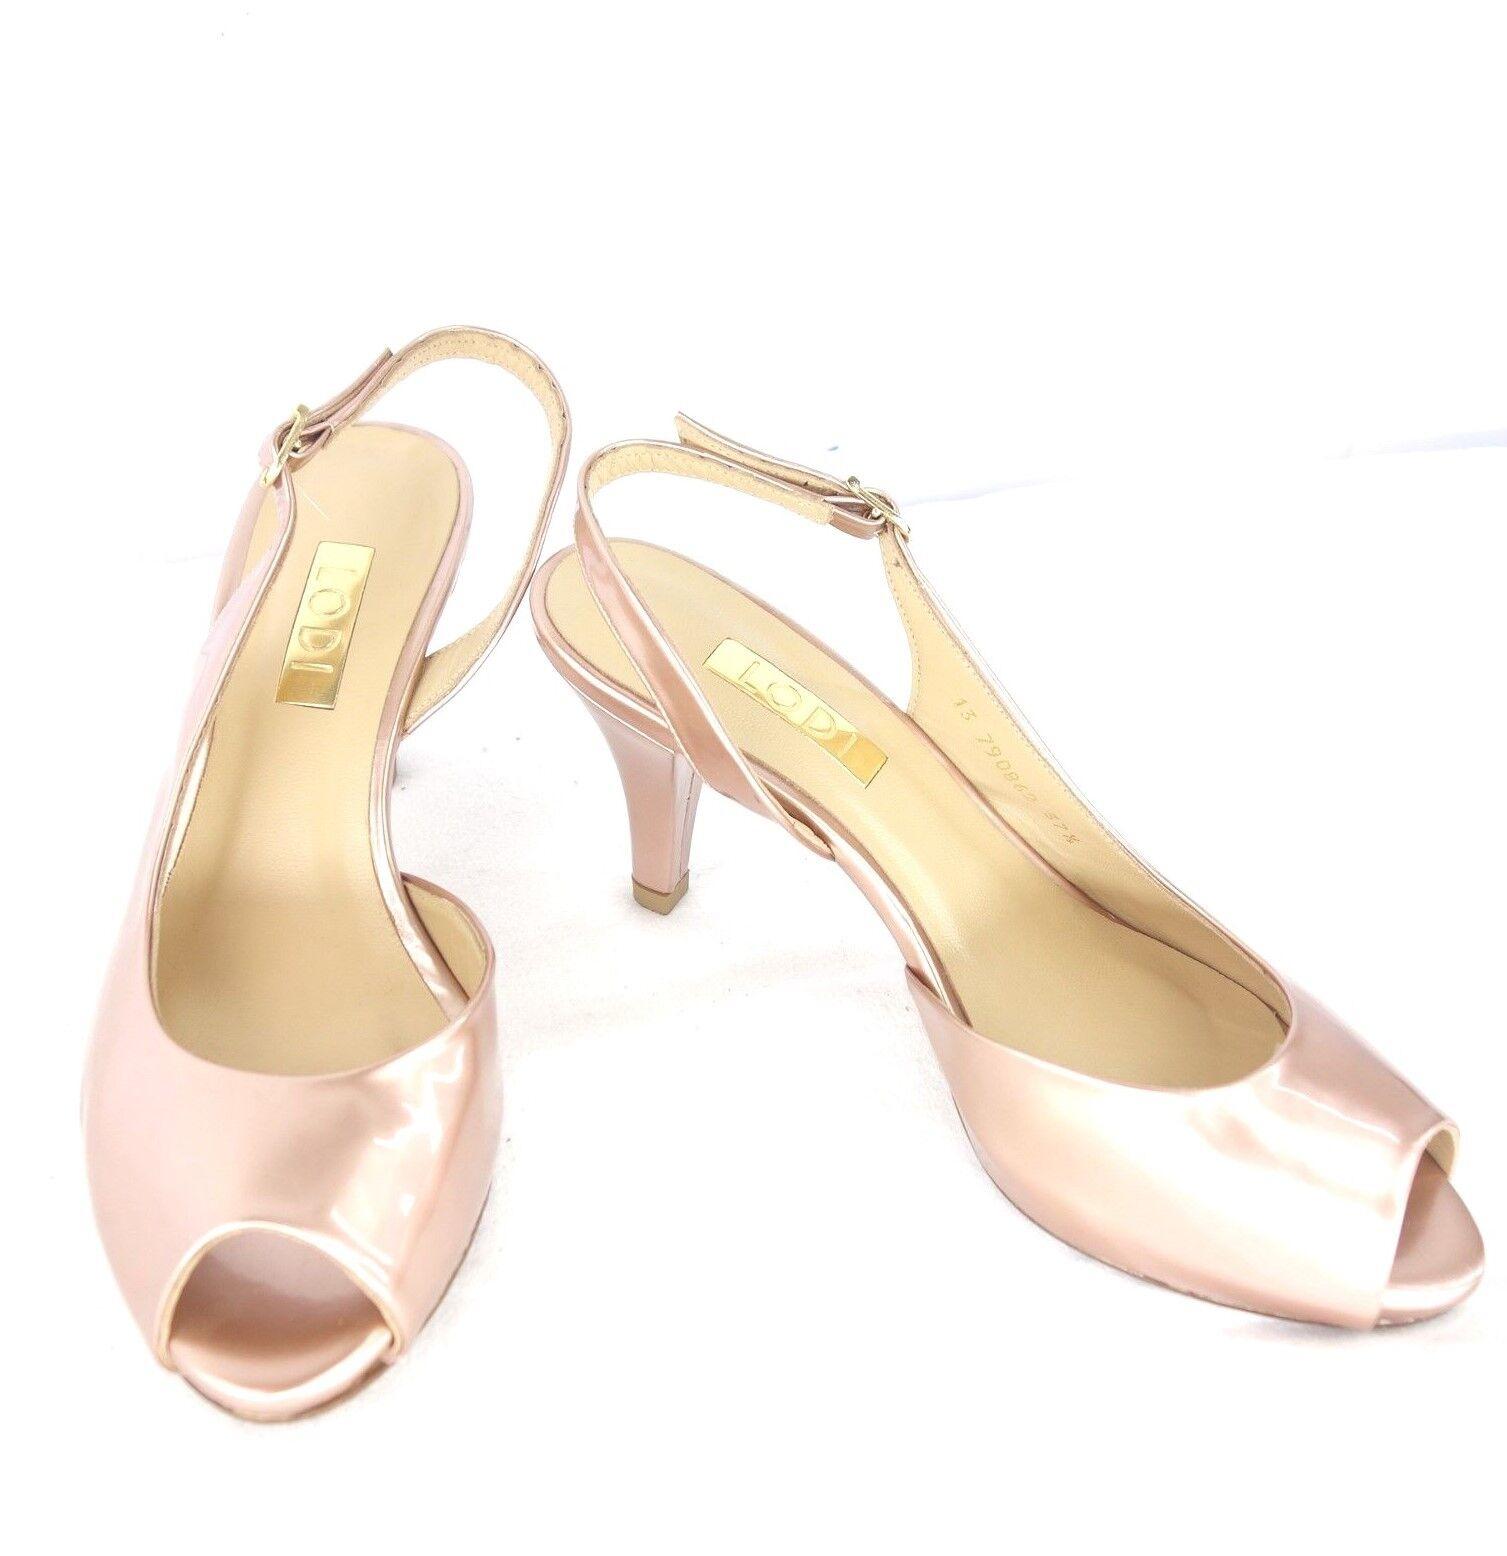 LODI Damen Schuhe Pumps Halbschuhe Peep Toes  Glanz  Toes Leder Rosa NP 159 NEU 991843